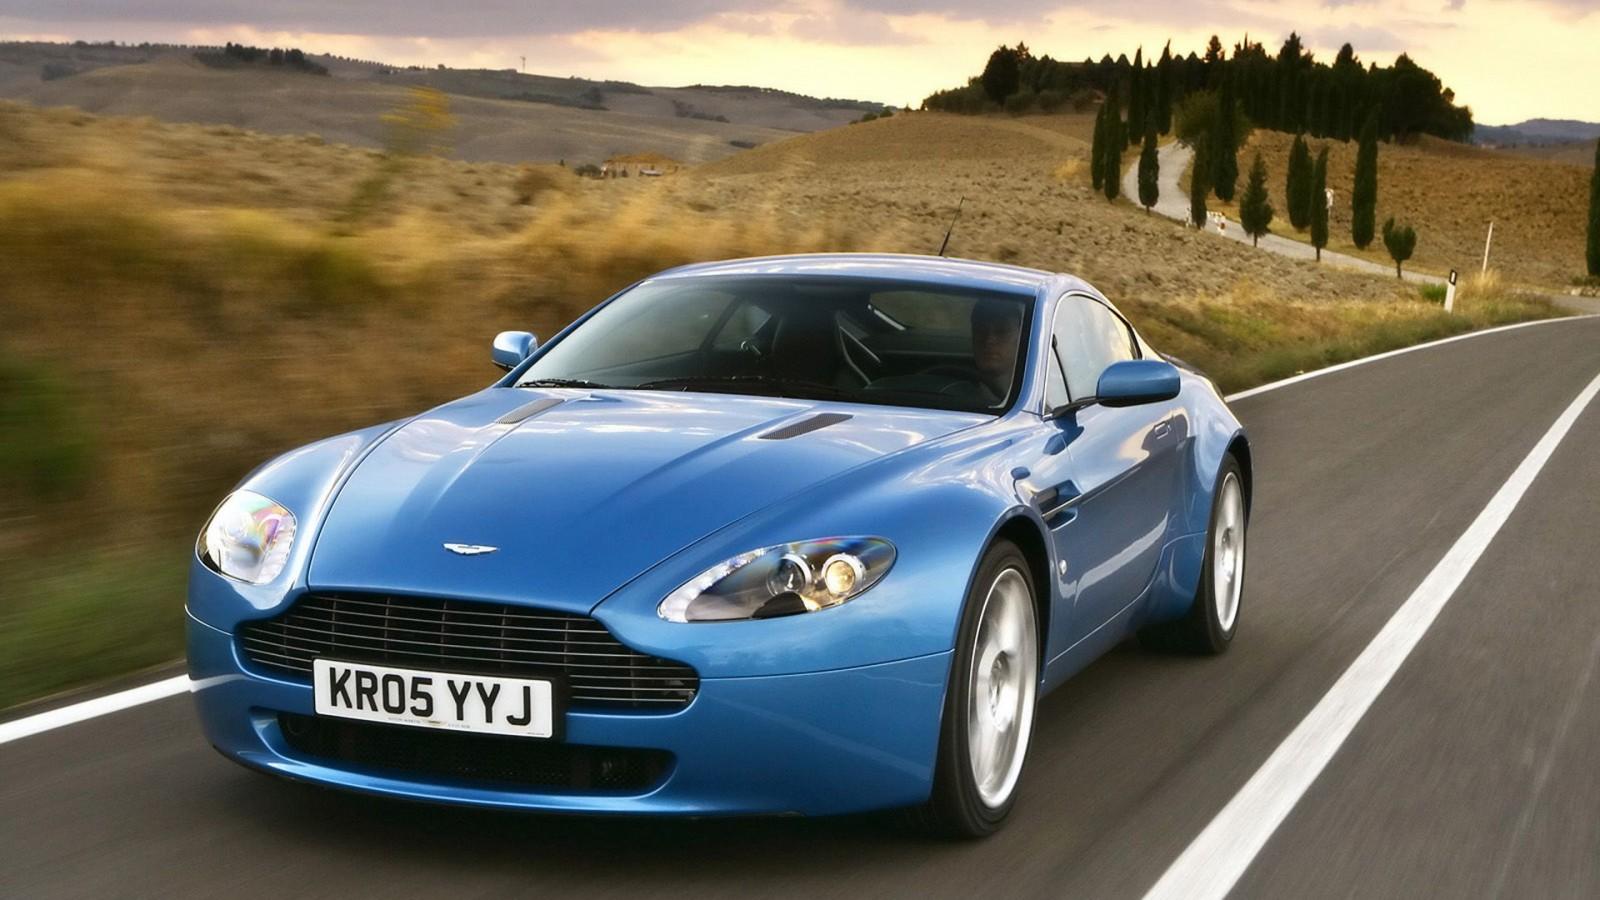 Aston Martin V8 Vantage  Sports Car  HD   Backgrounds HD Wallpaper